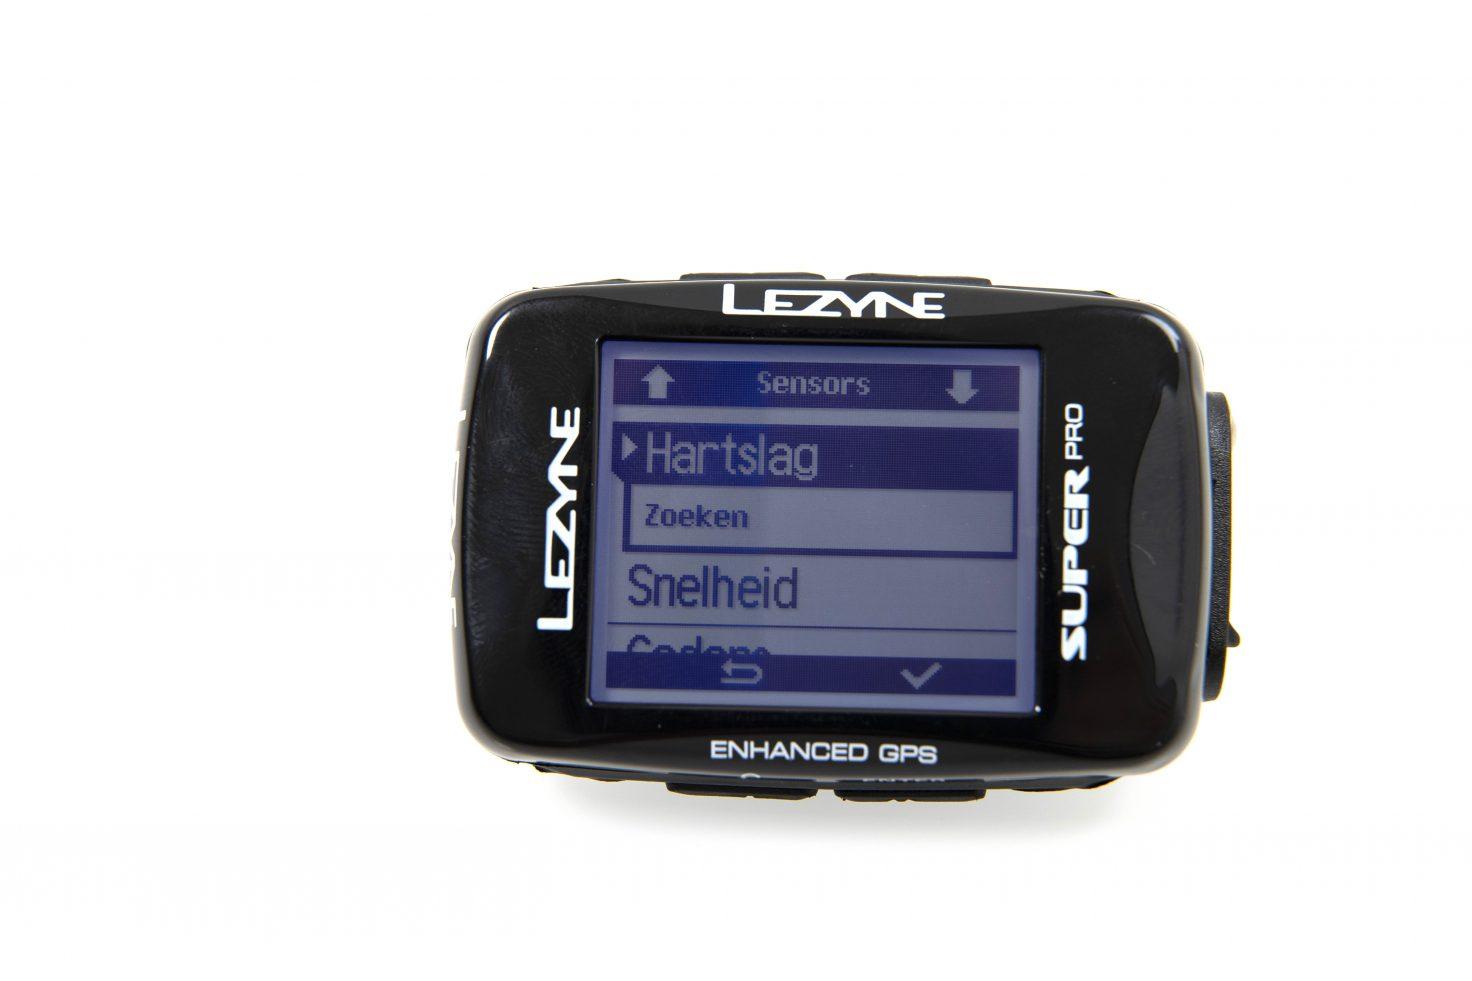 Lezyne Pro GPS